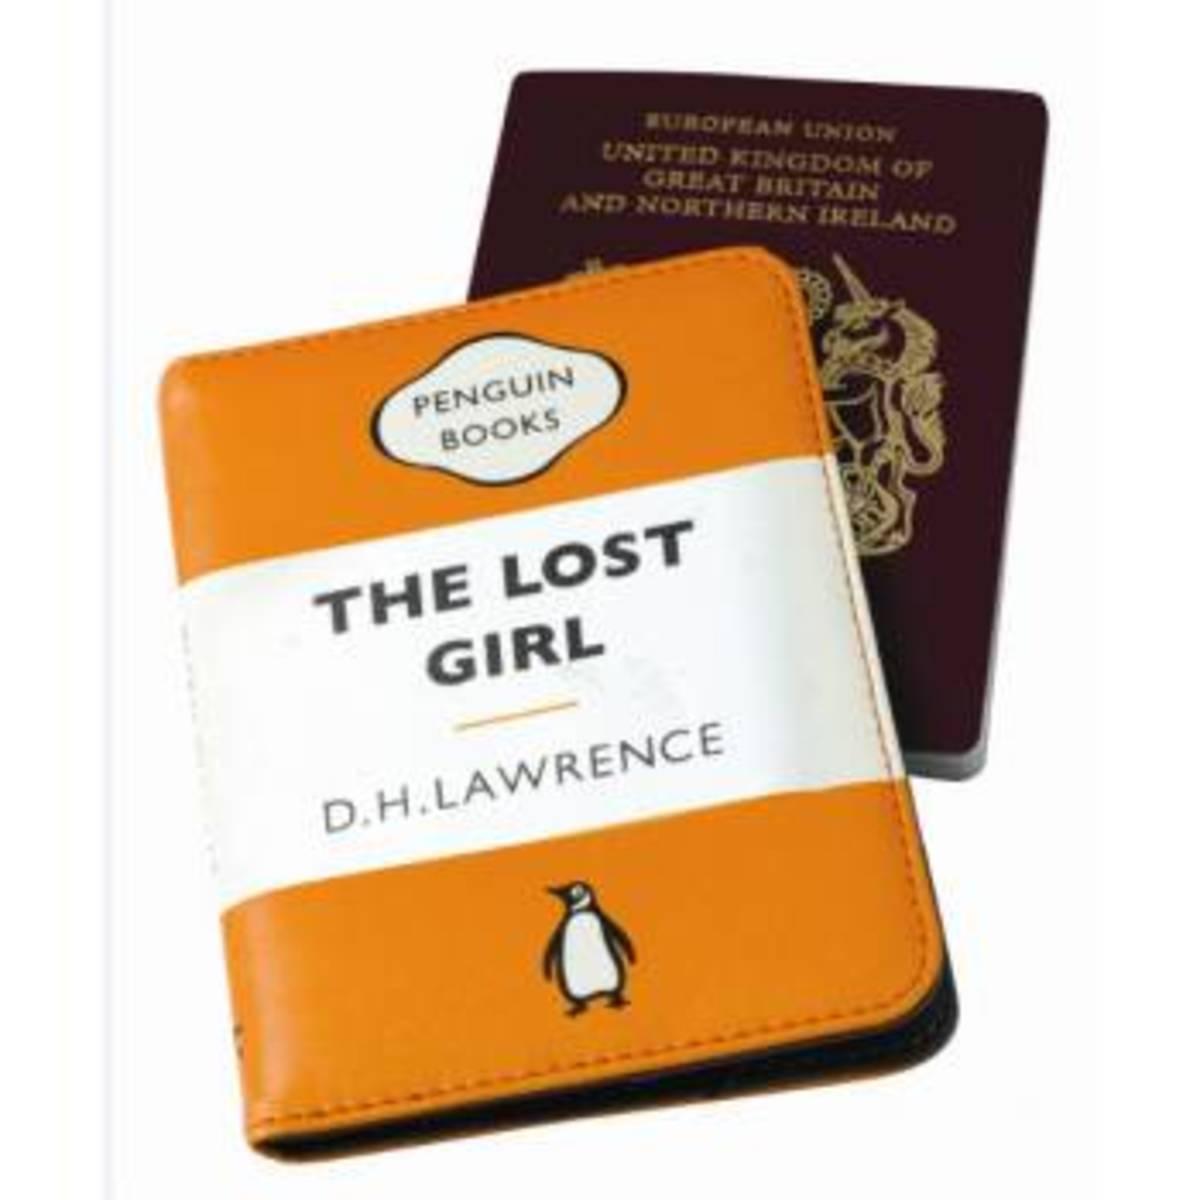 Penguin Book Passport Cover